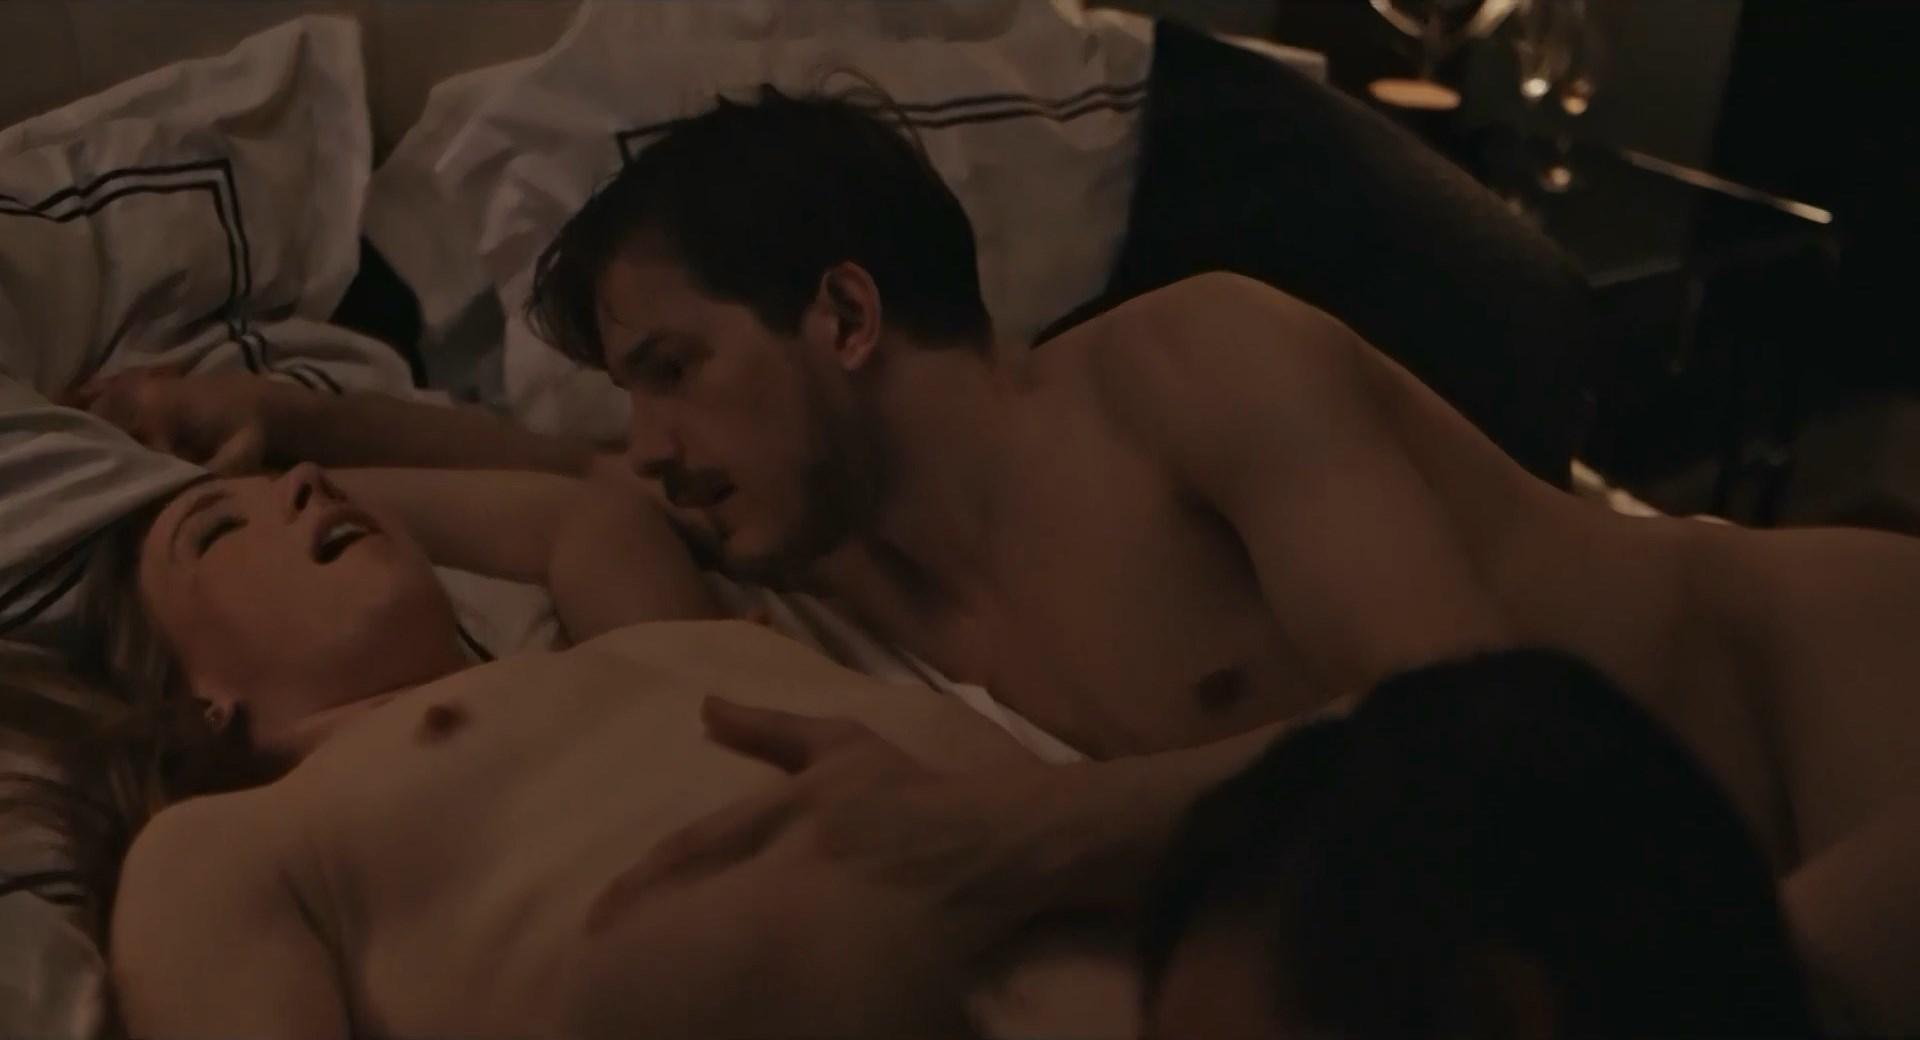 nackt Lehner Lilia Nackt Nude